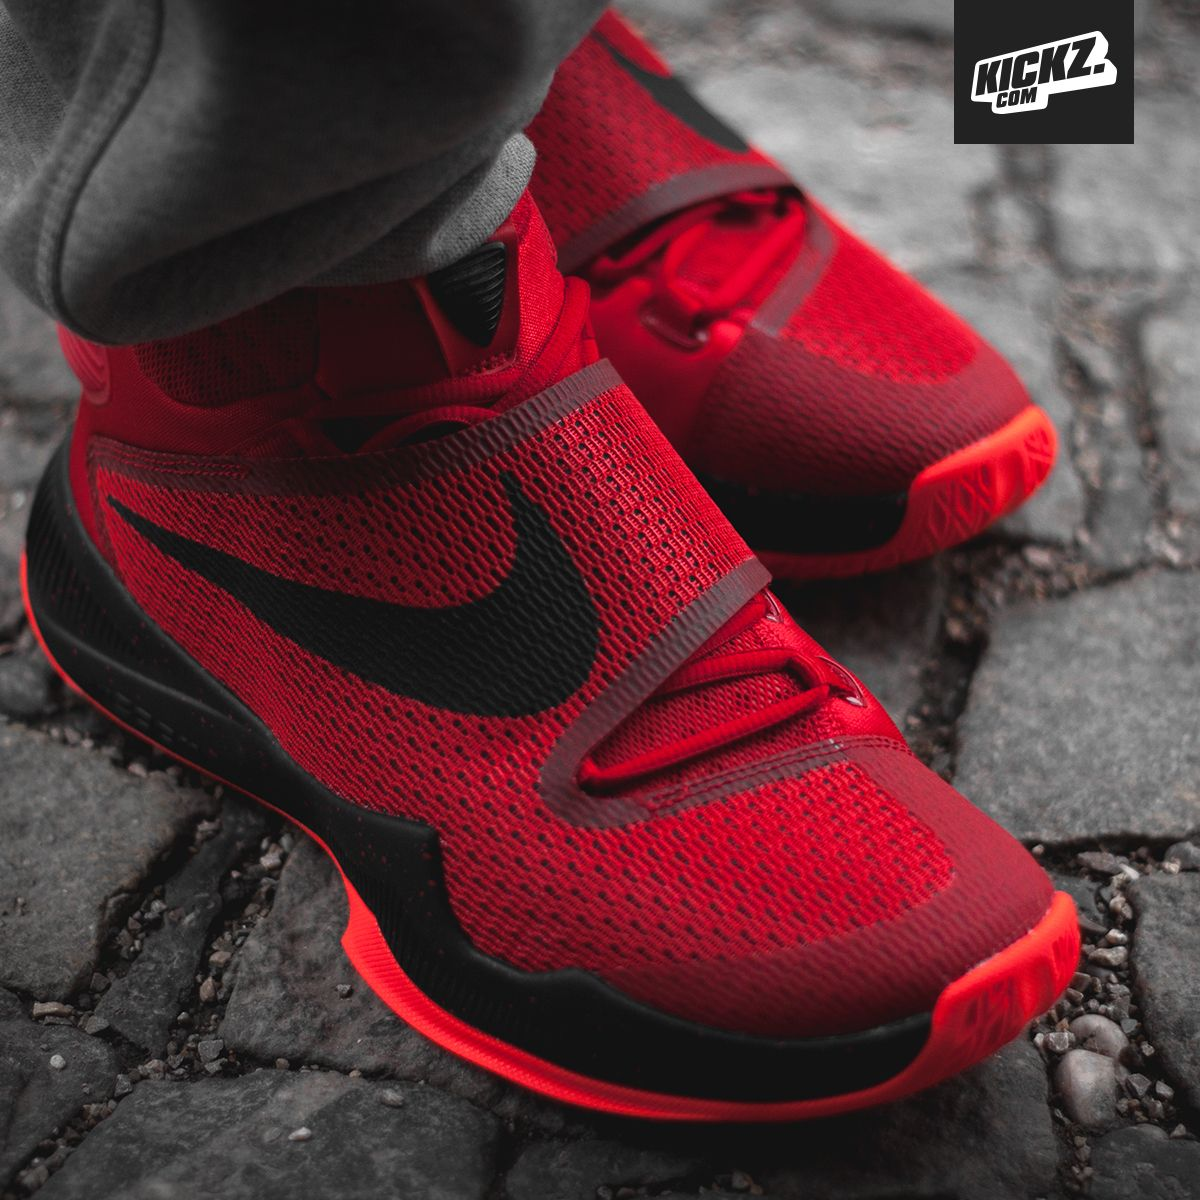 a821fae8403ea The new Nike Hyperrev 2016 basketball shoe is a beast!